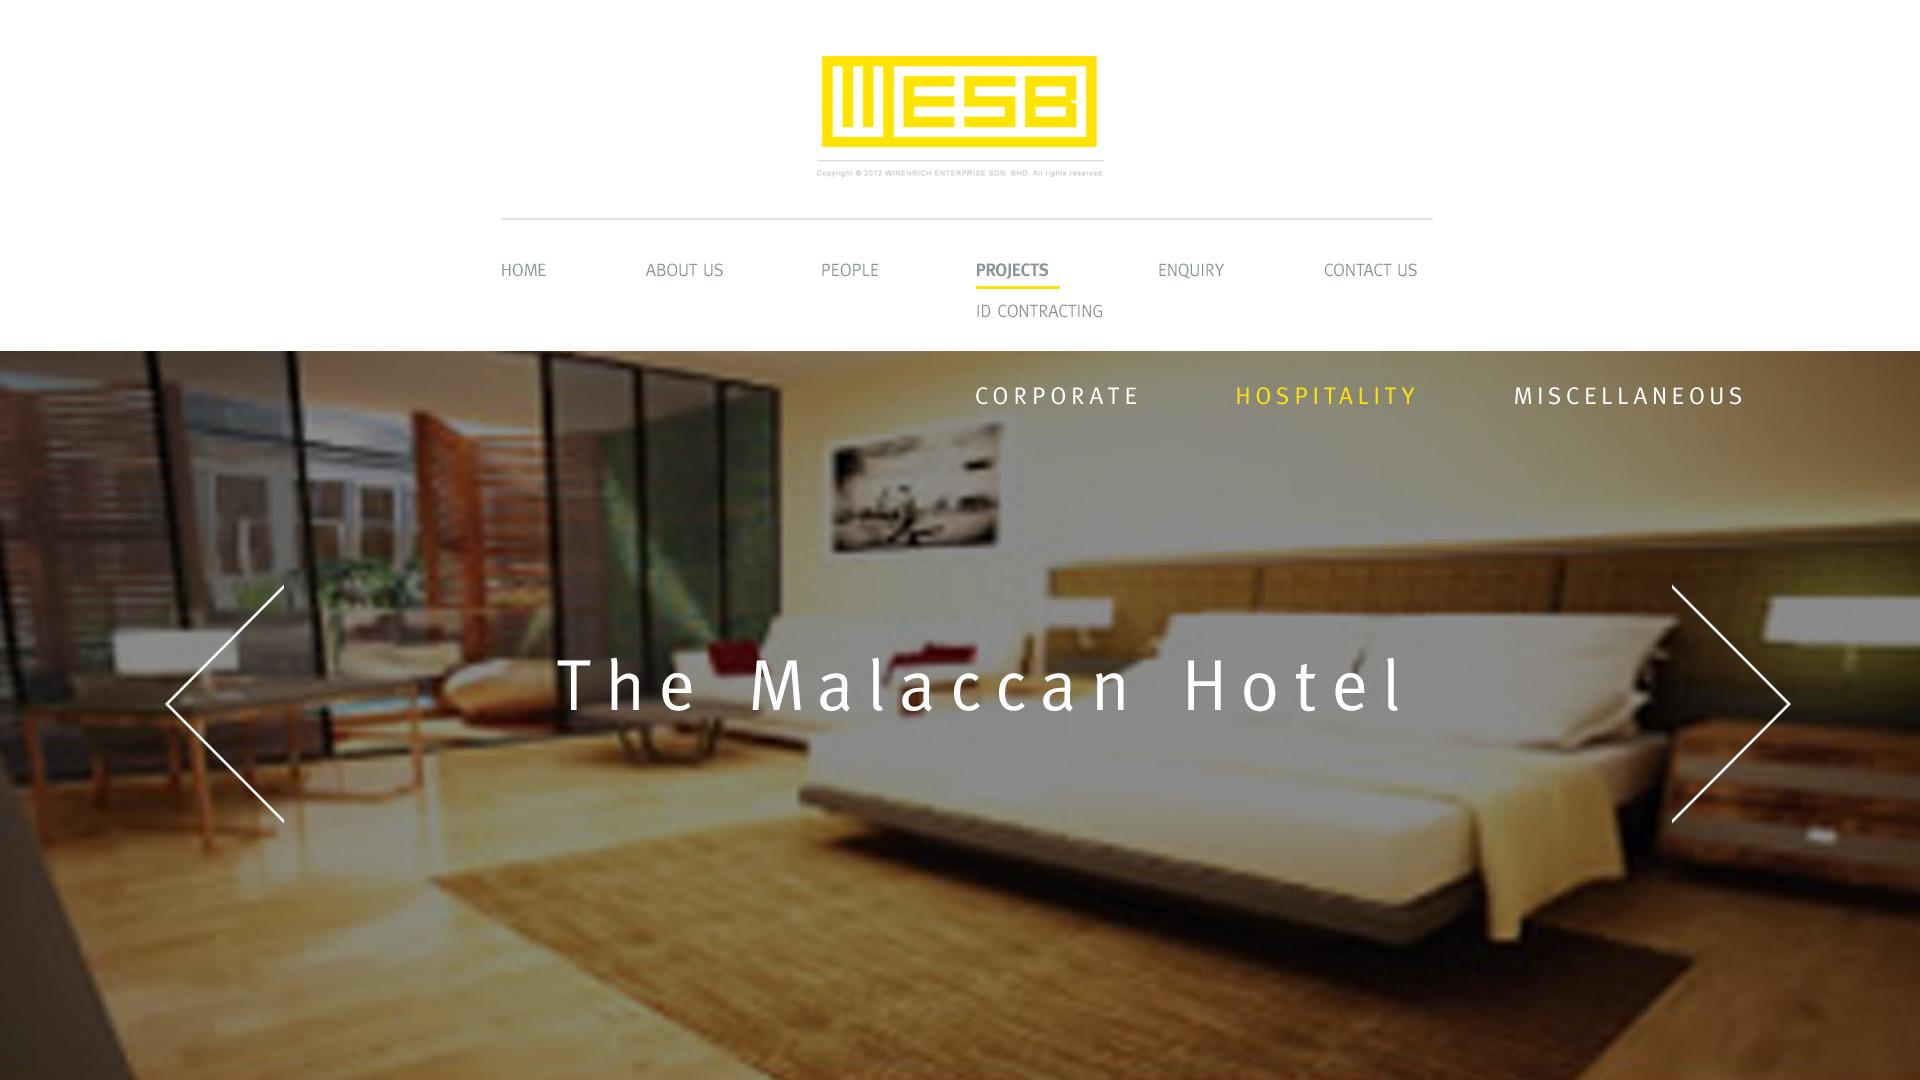 WESB 'CORPORATE WEBSITE'